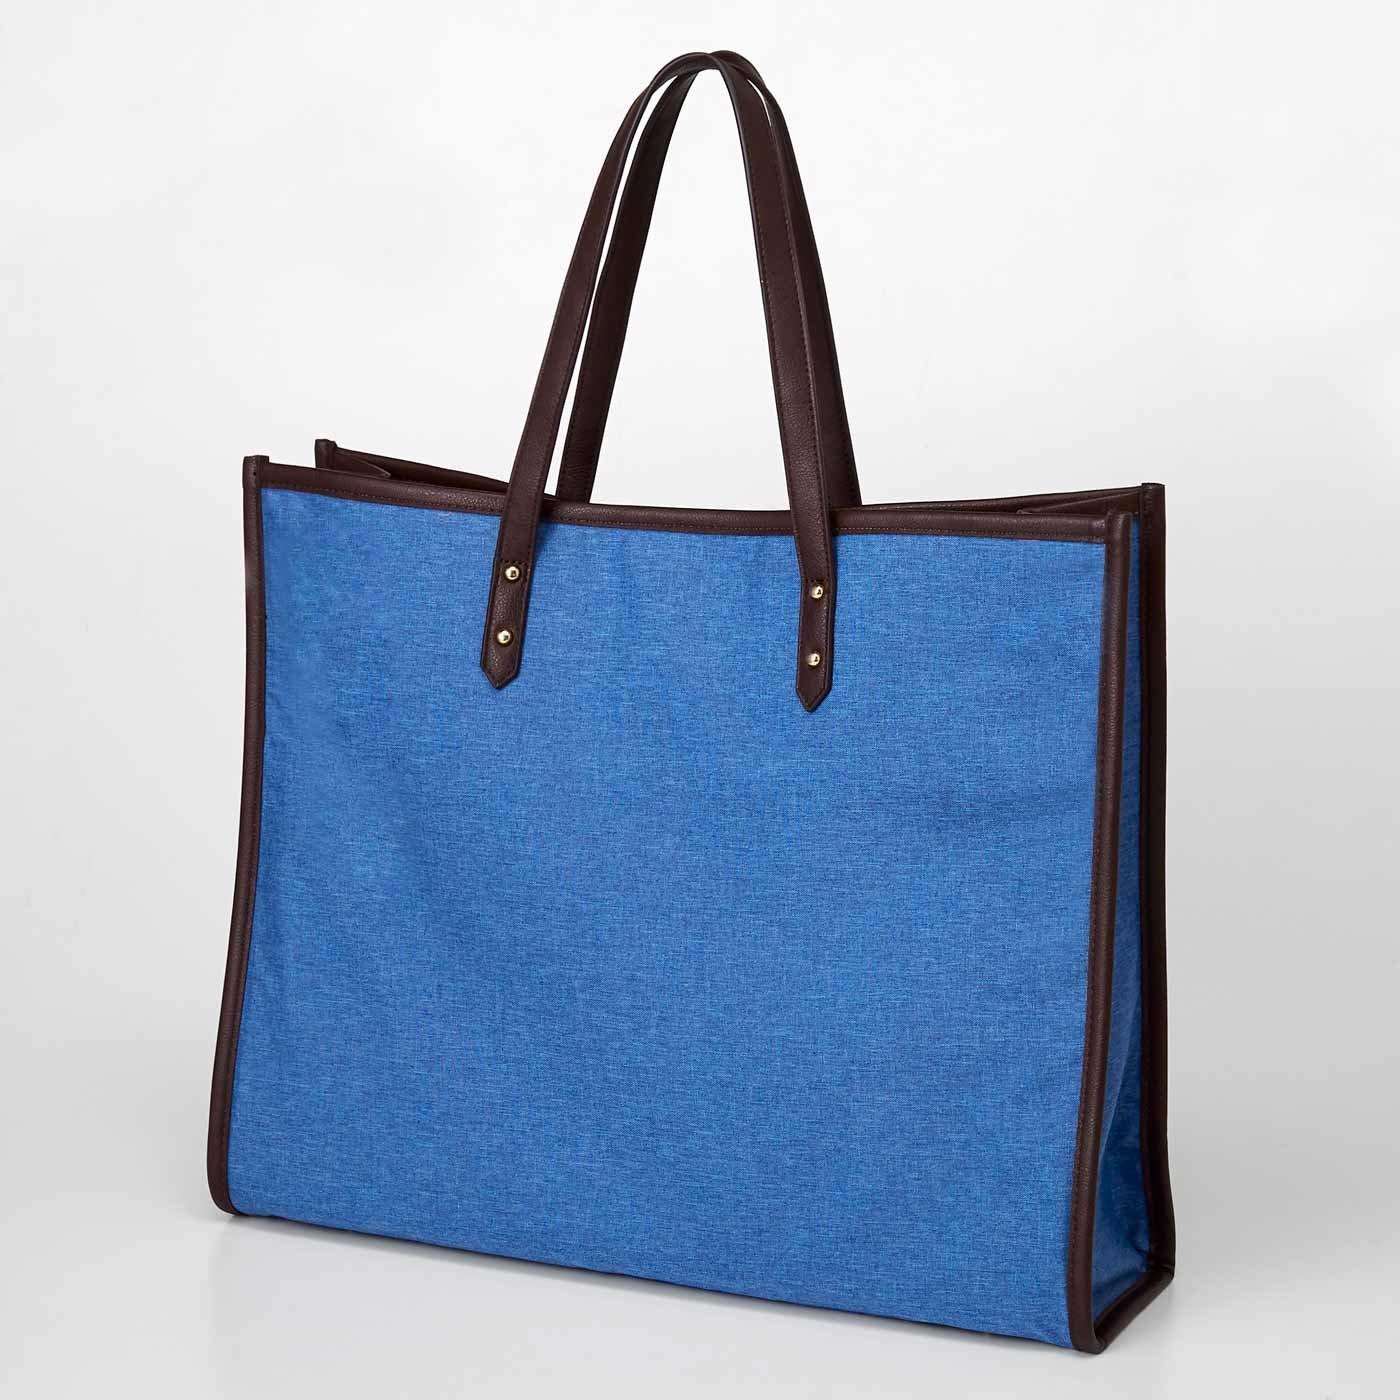 OSYAIRO ジャンボうちわが入るパイピングトートバッグ〈ブルー〉